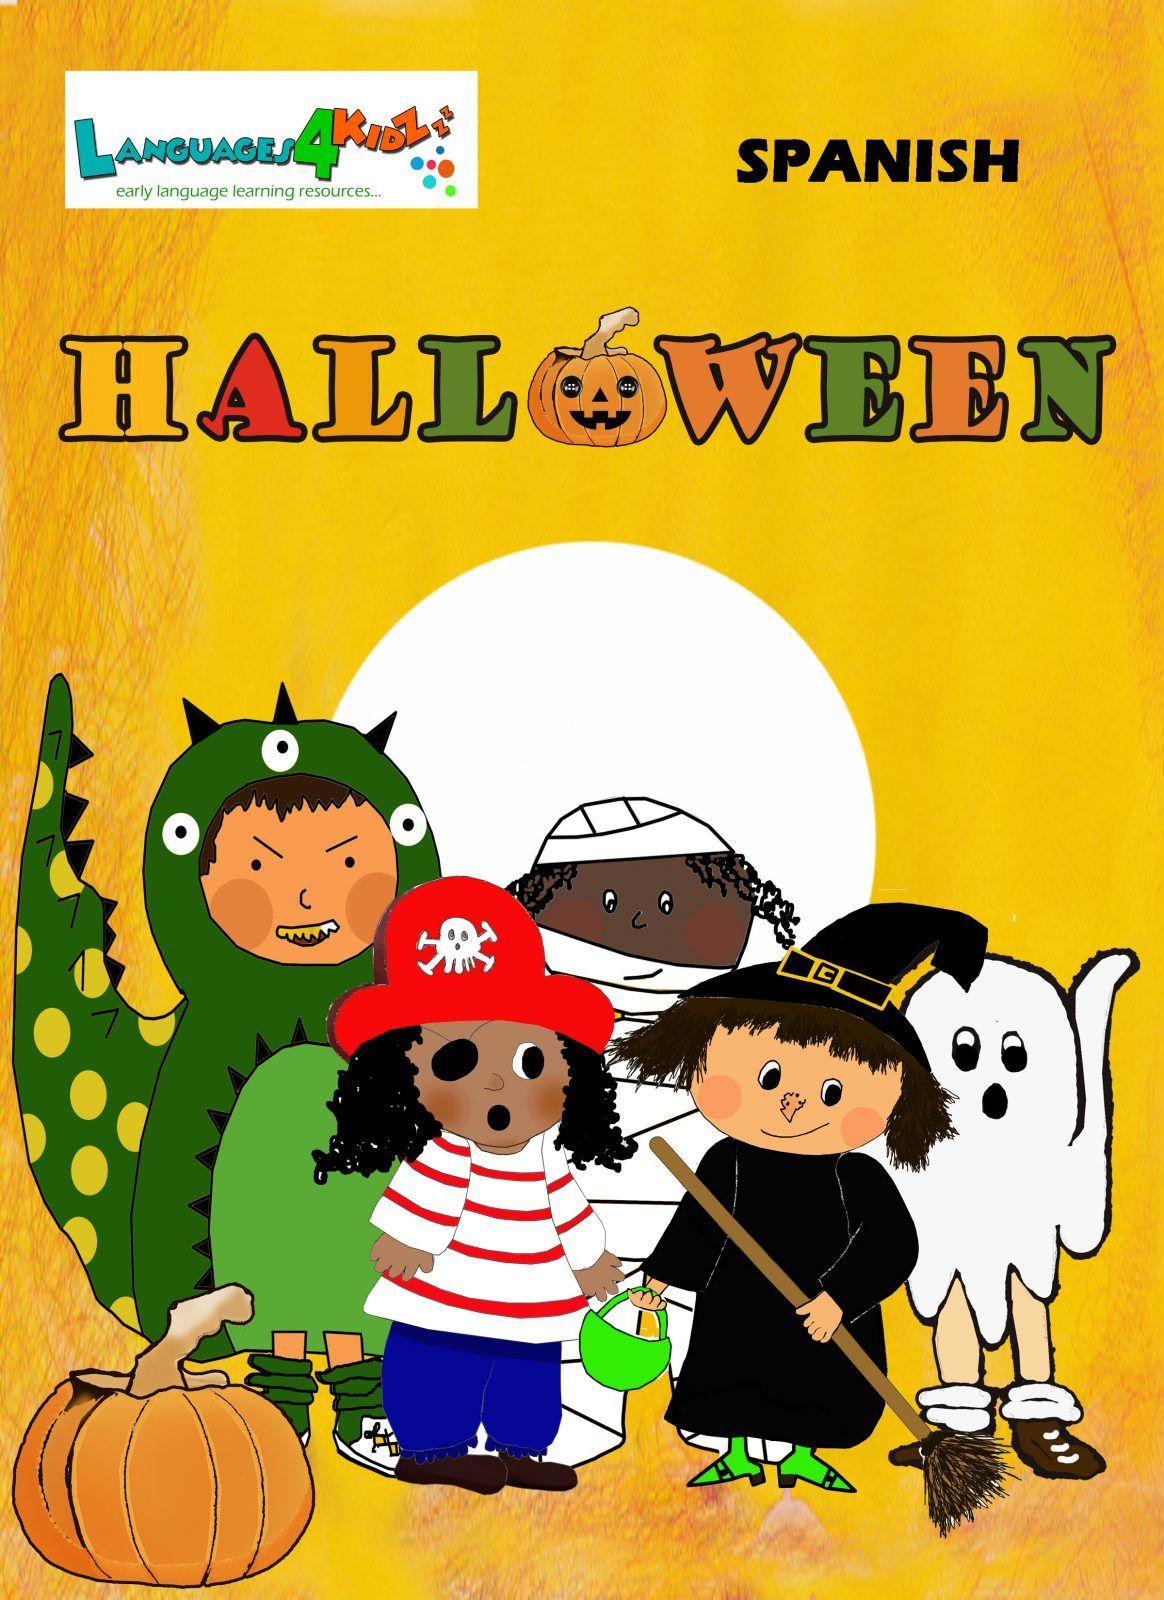 Halloween Booklet Spanish for kids Languages4kidz